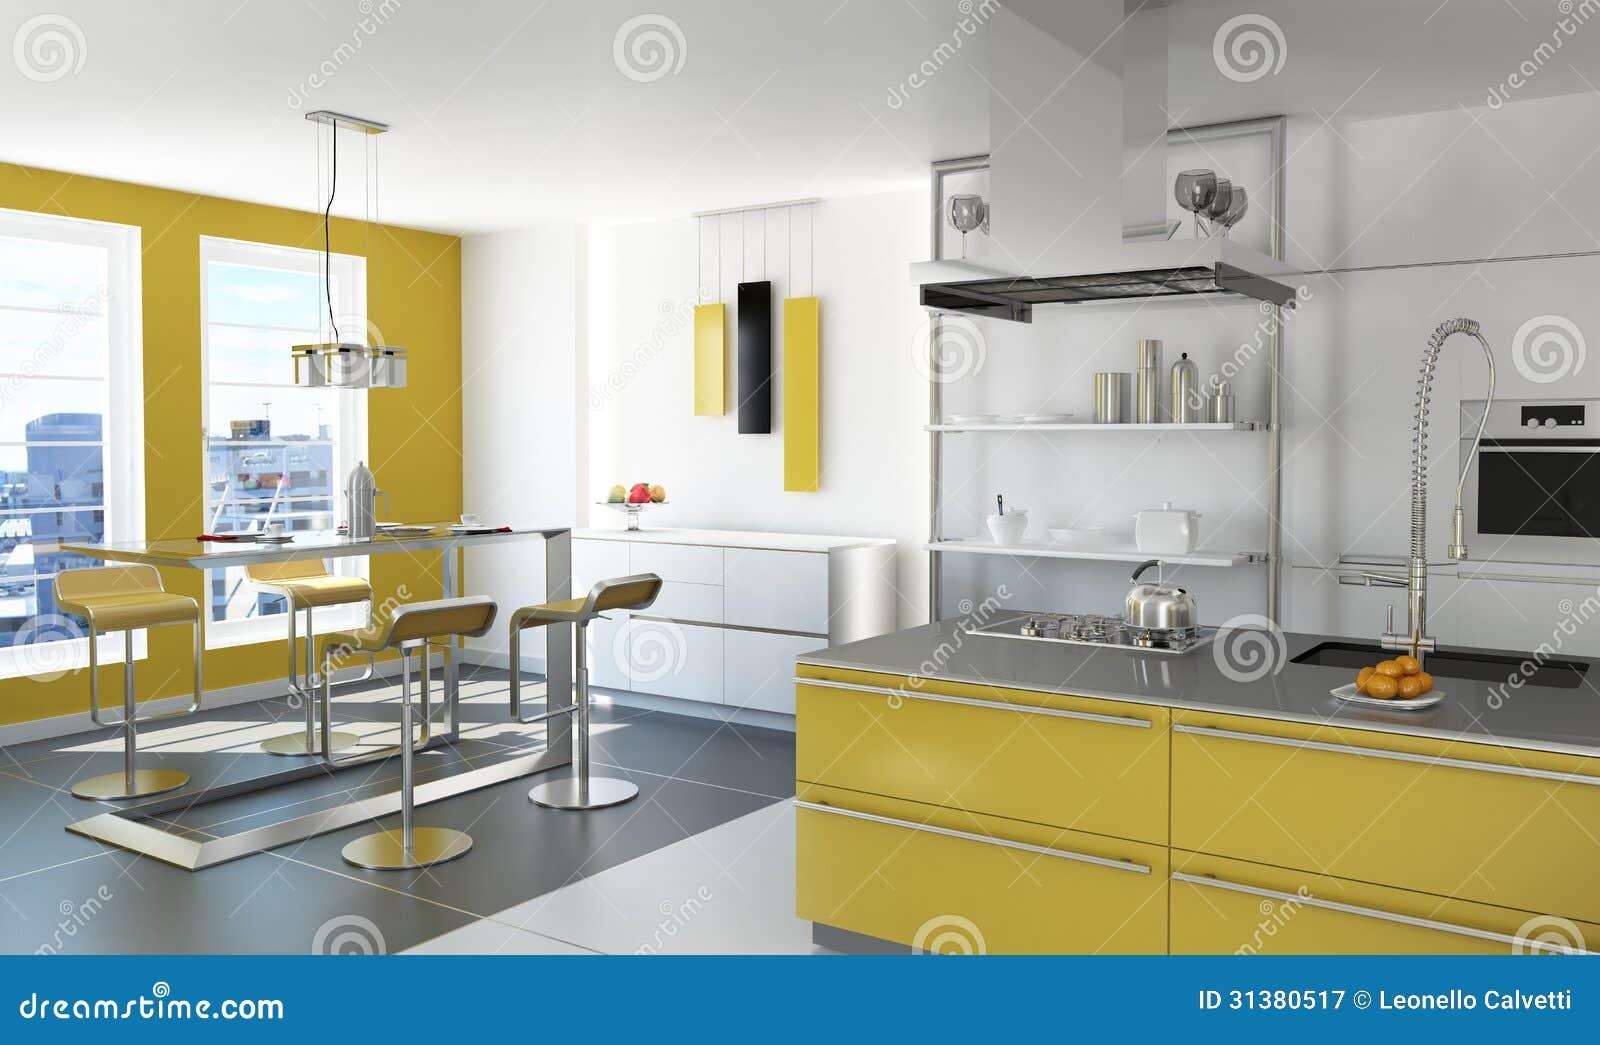 Moderne Gele Keuken. Royalty-vrije Stock Fotografie - Afbeelding ...